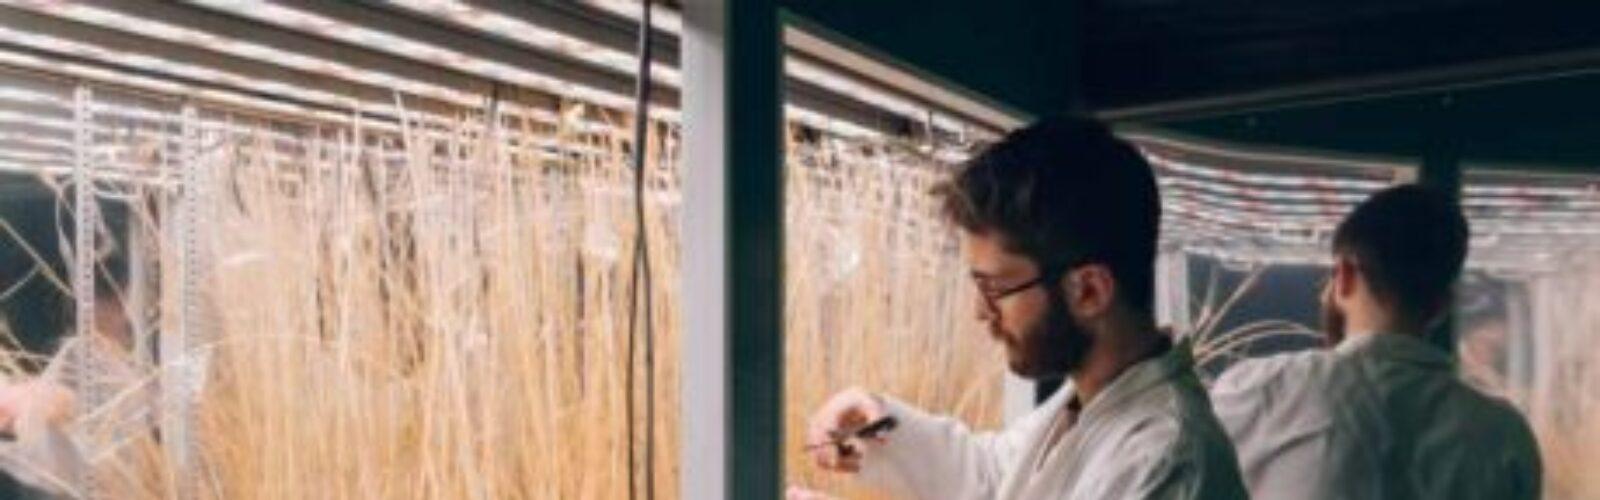 sheffield-university-plant-growth-cabinet-LED